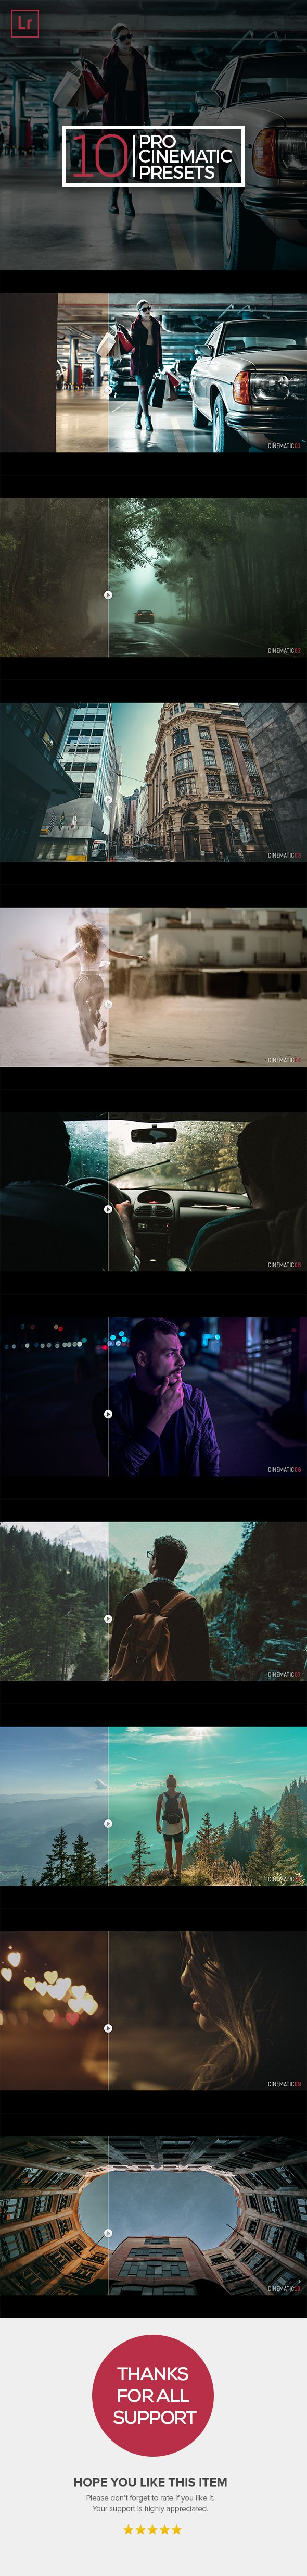 #Pro Cinematic - Cinematic #Lightroom #Presets